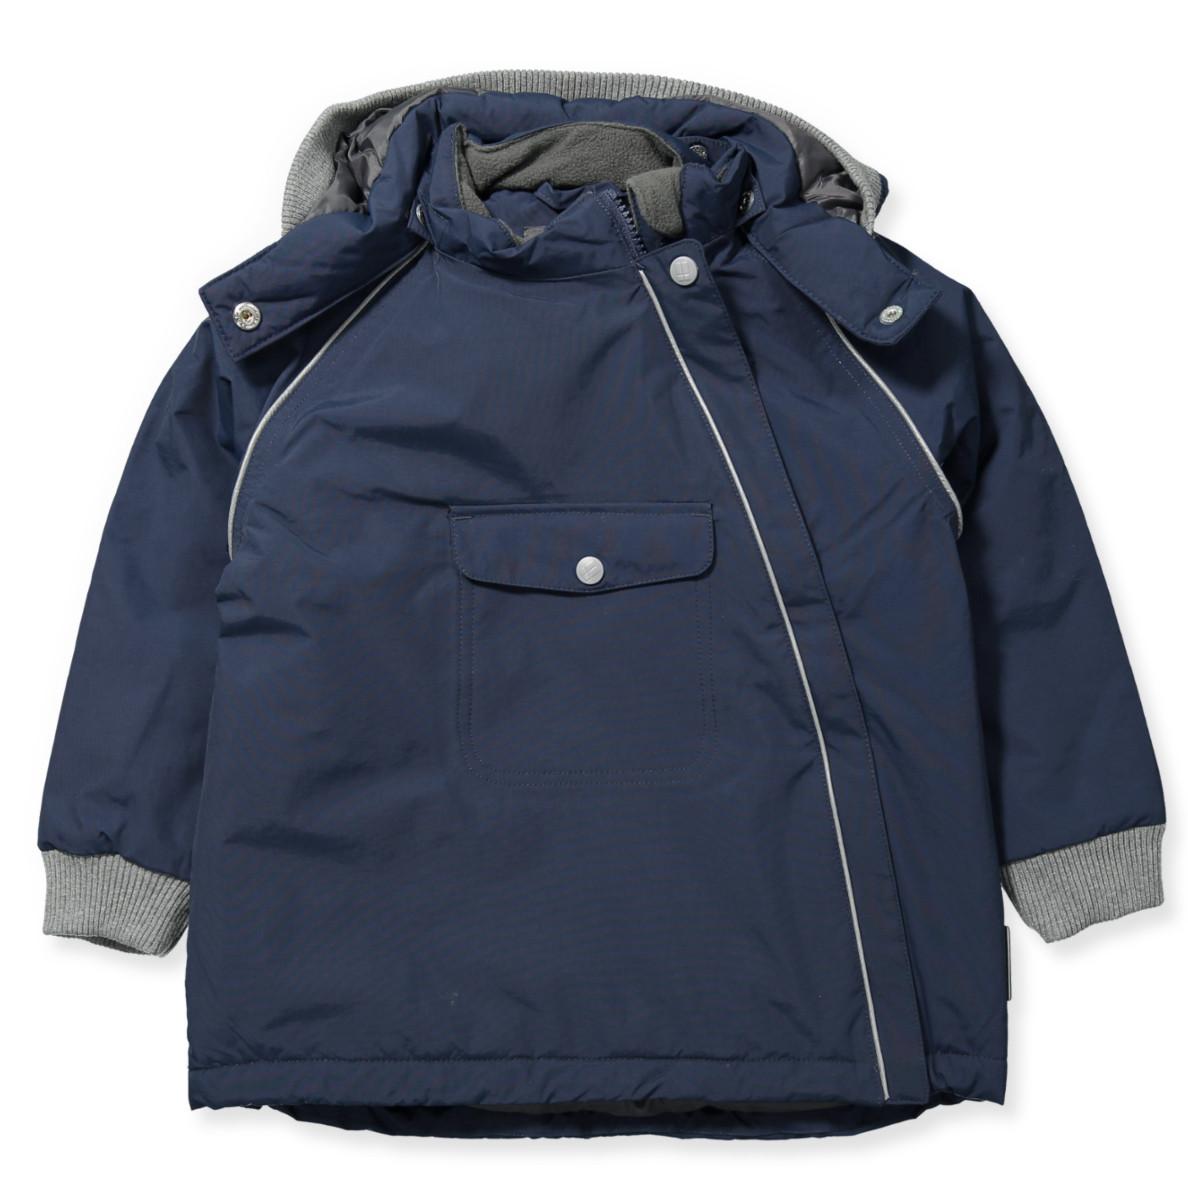 fd7d6ebf241 Hust & Claire - Oby winter jacket - Blues - Blue